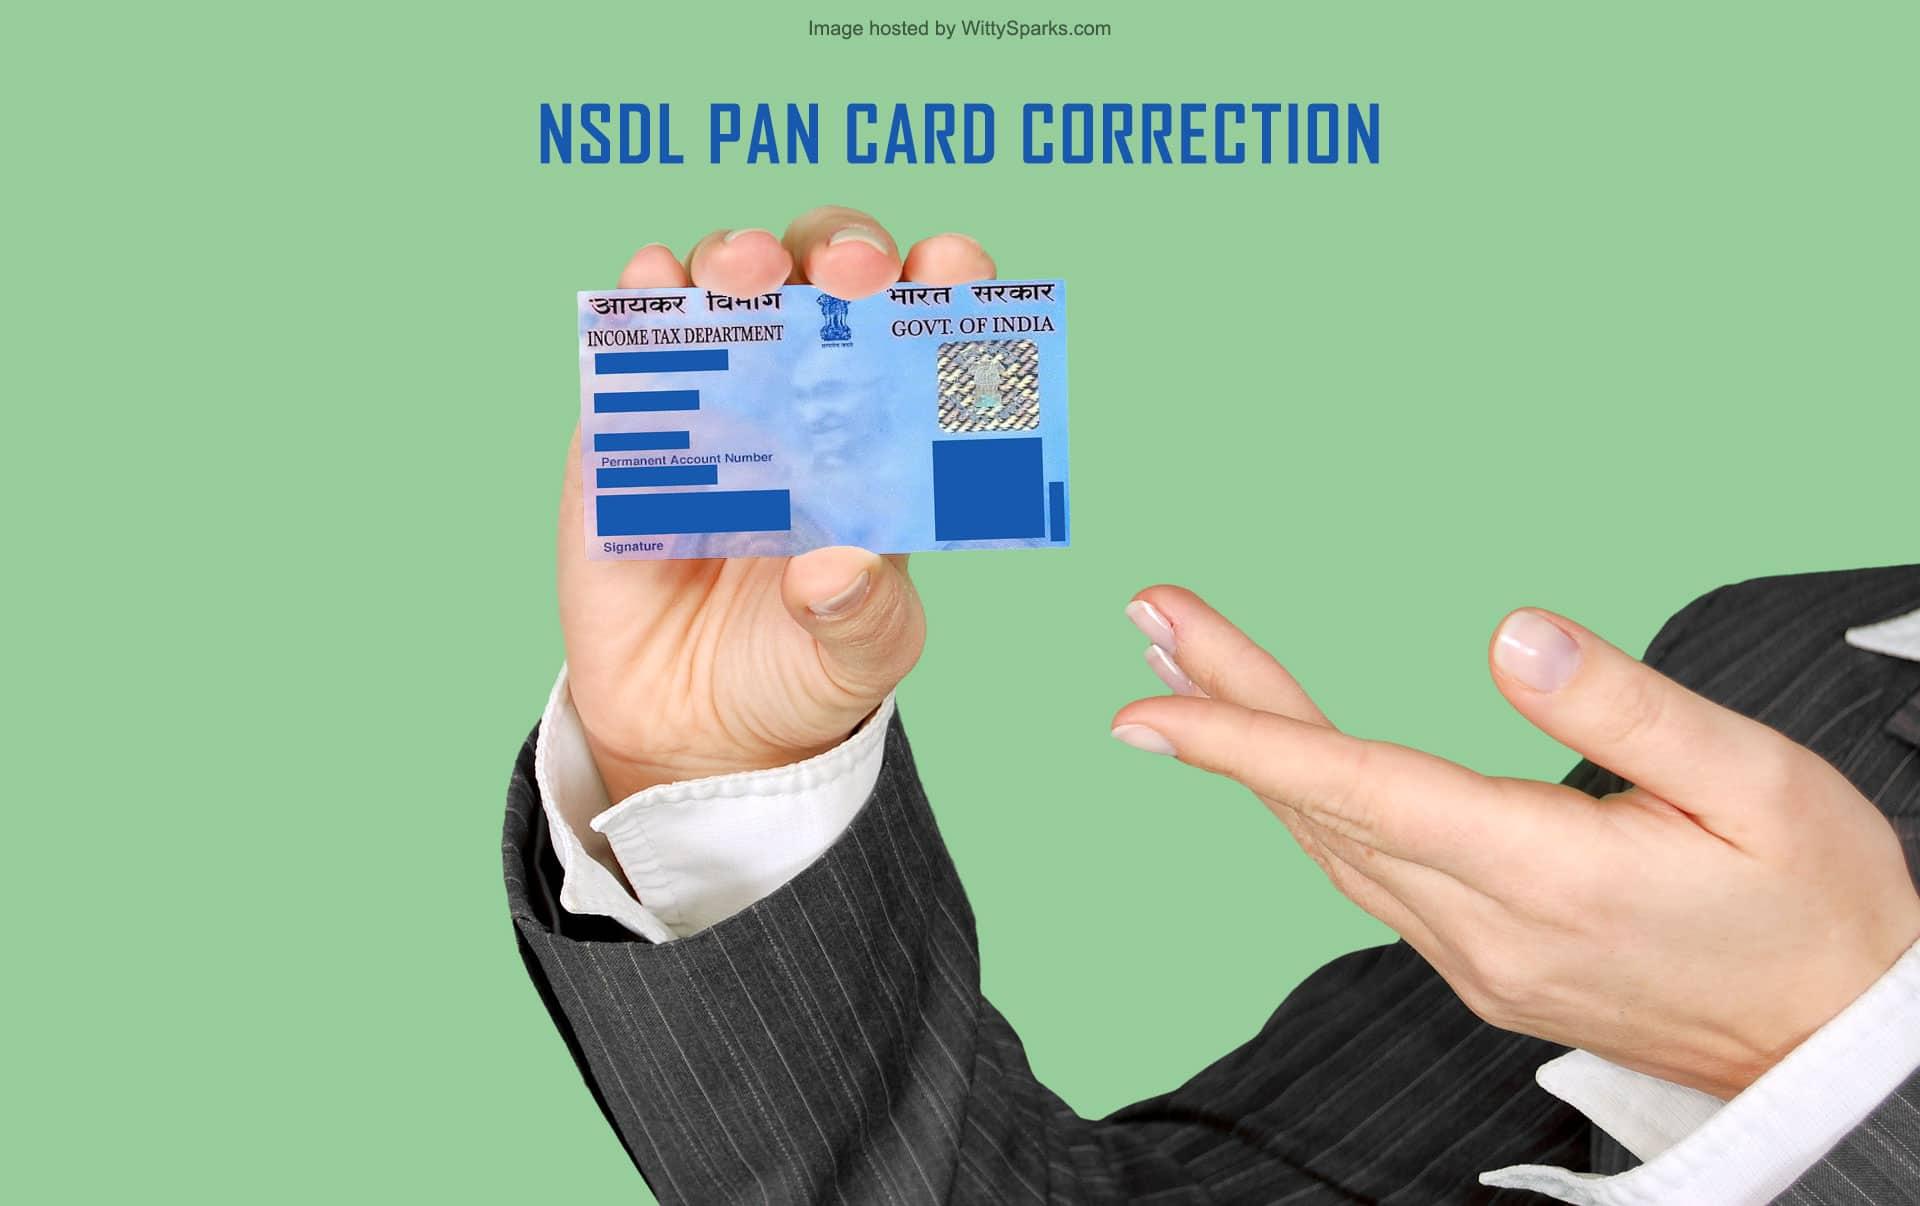 utiitsl nsdl pan card corrections